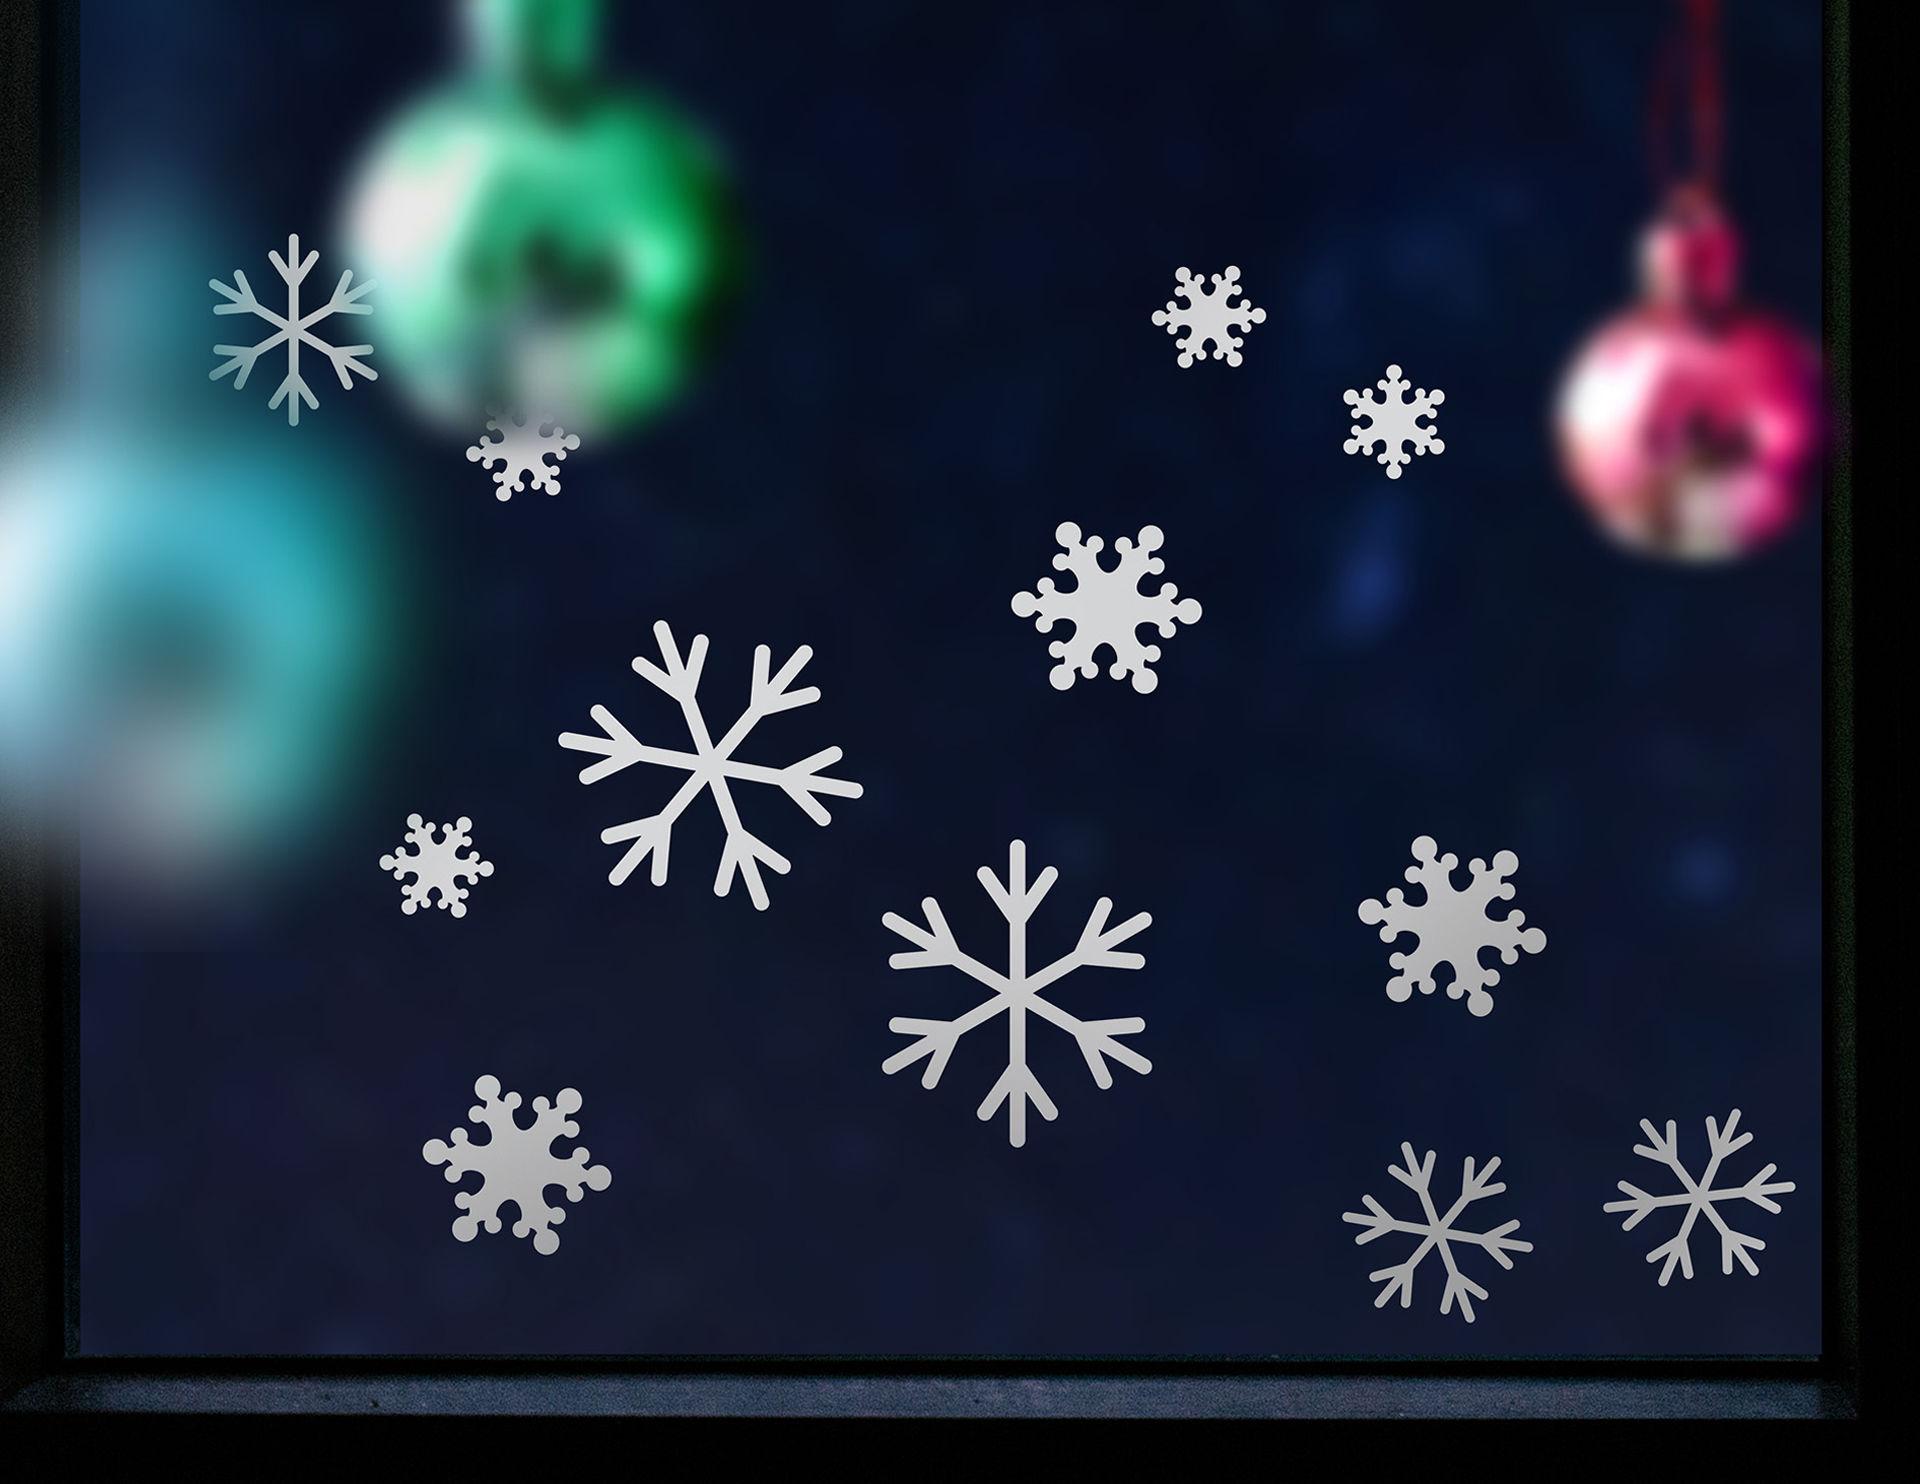 Wandtattoo Schneeflocken Set